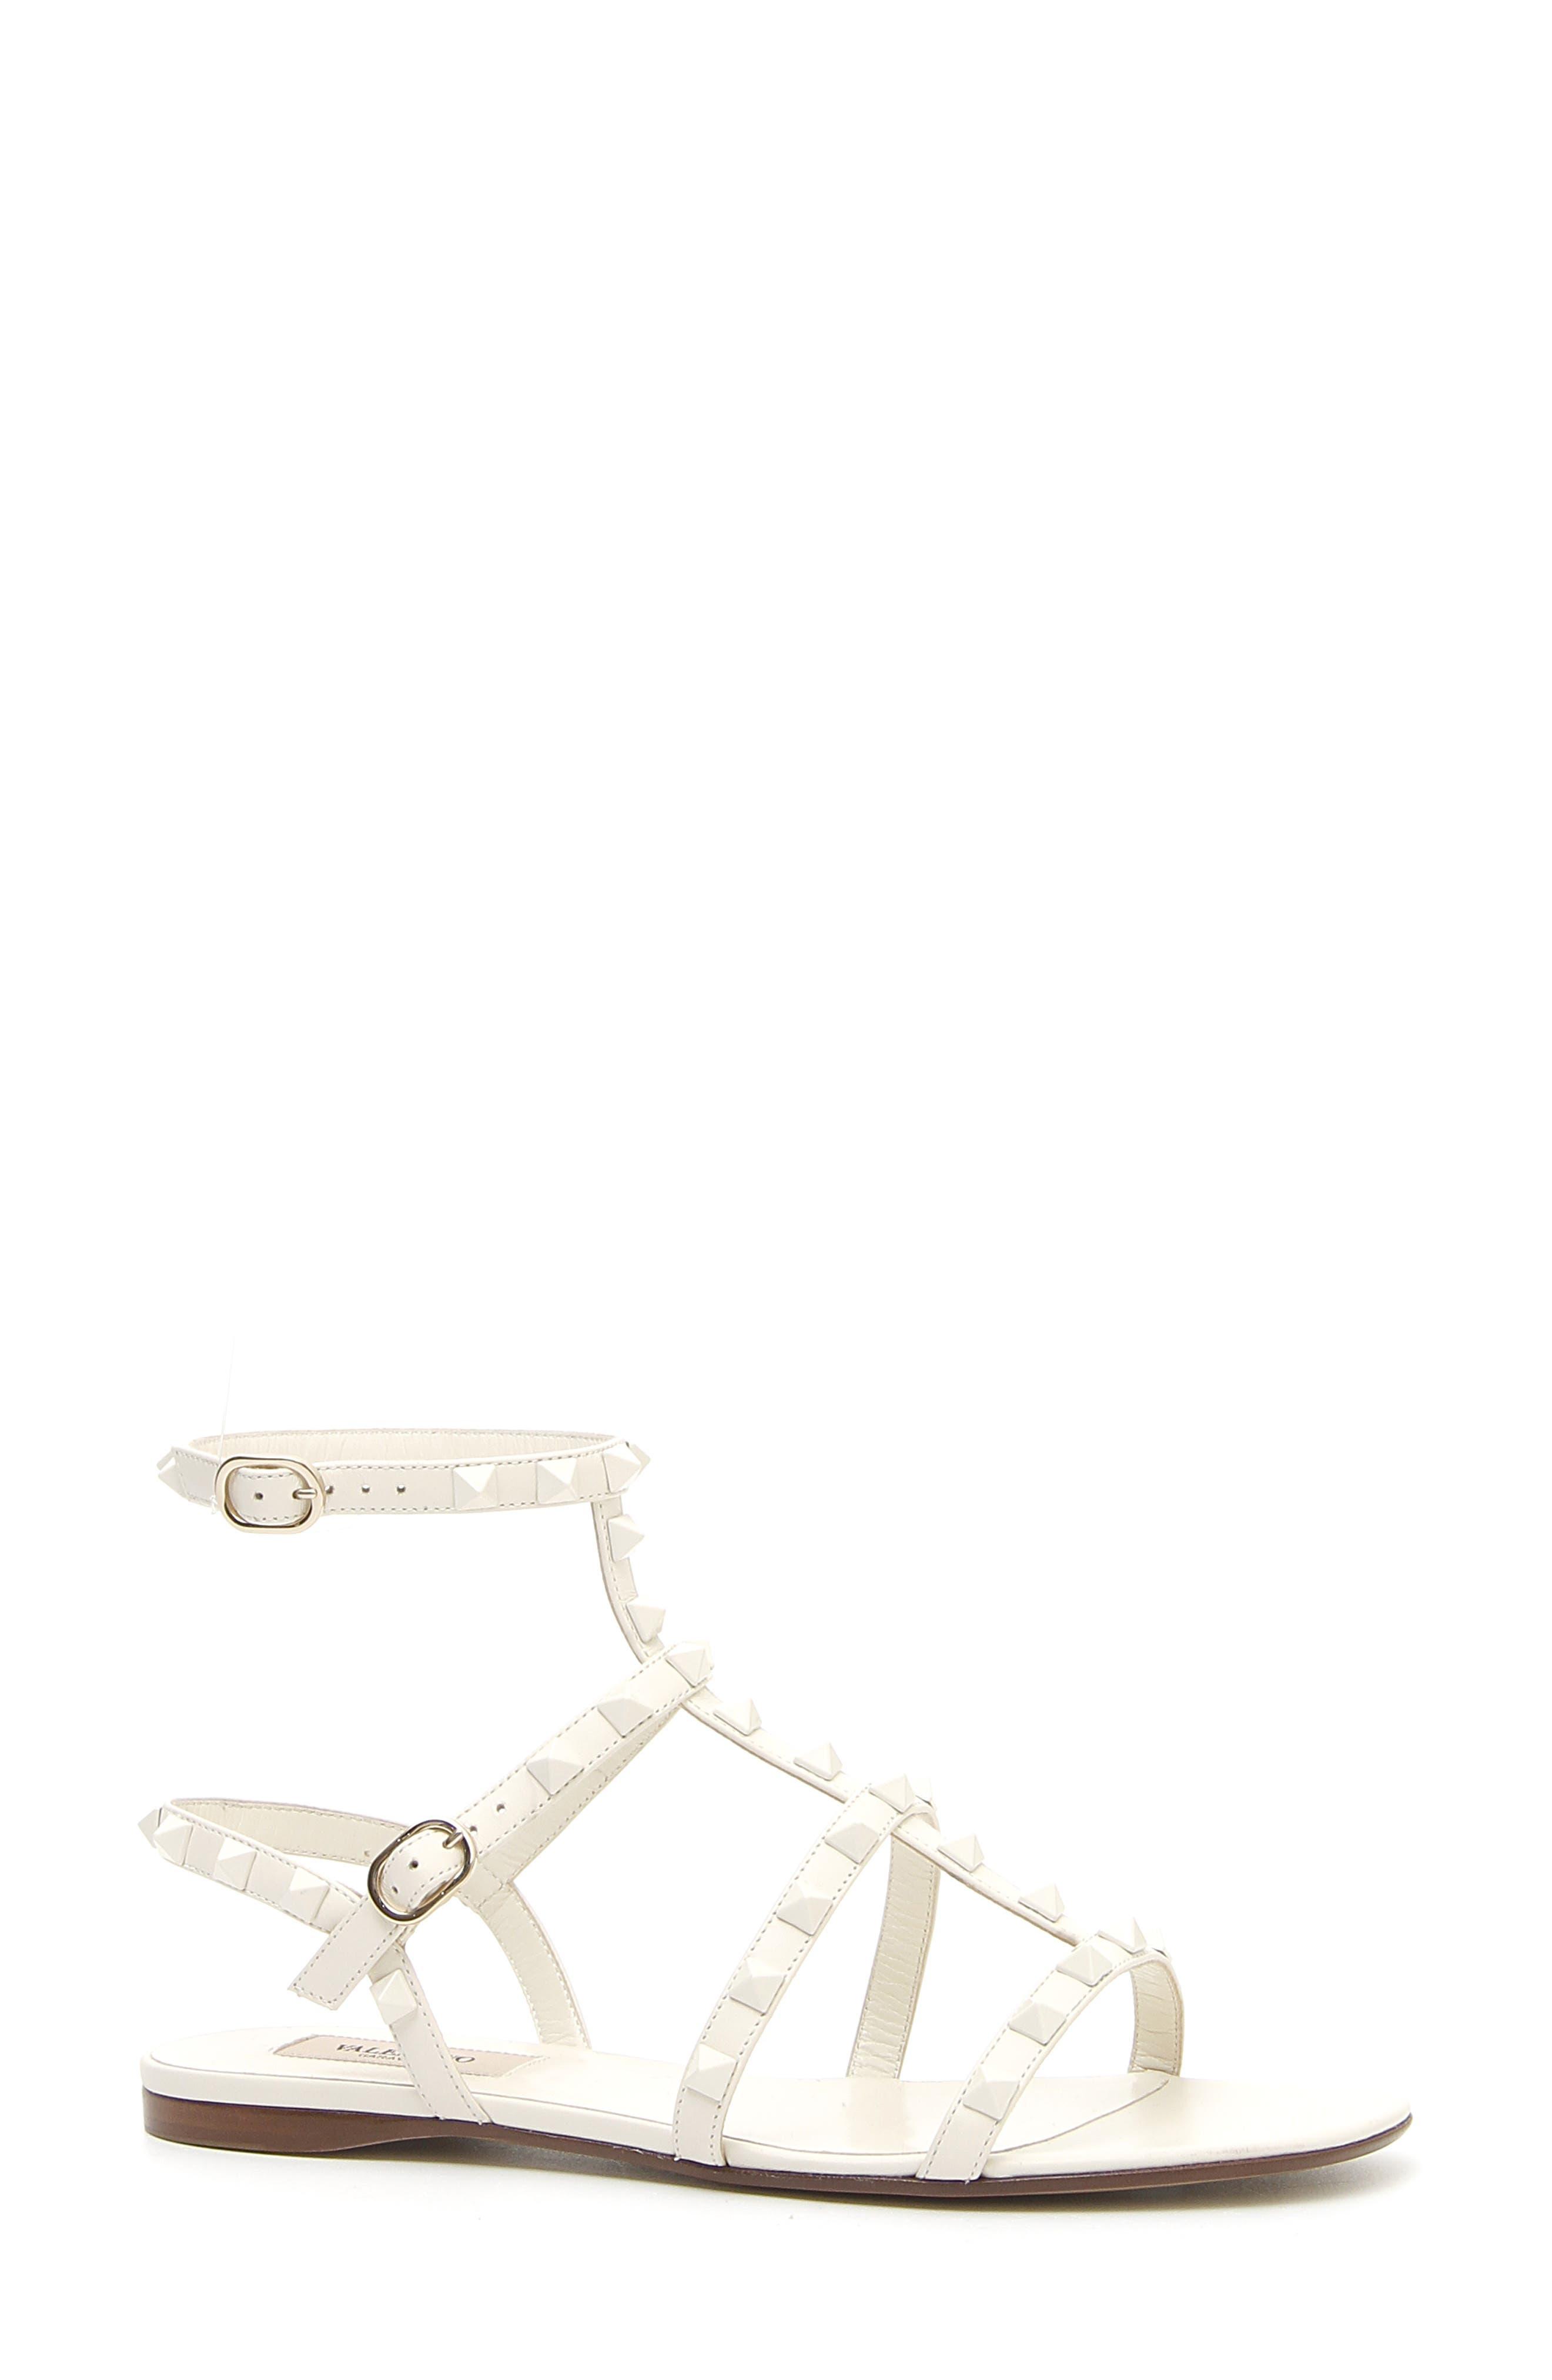 VALENTINO GARAVANI Rockstud Gladiator Sandal (Women)